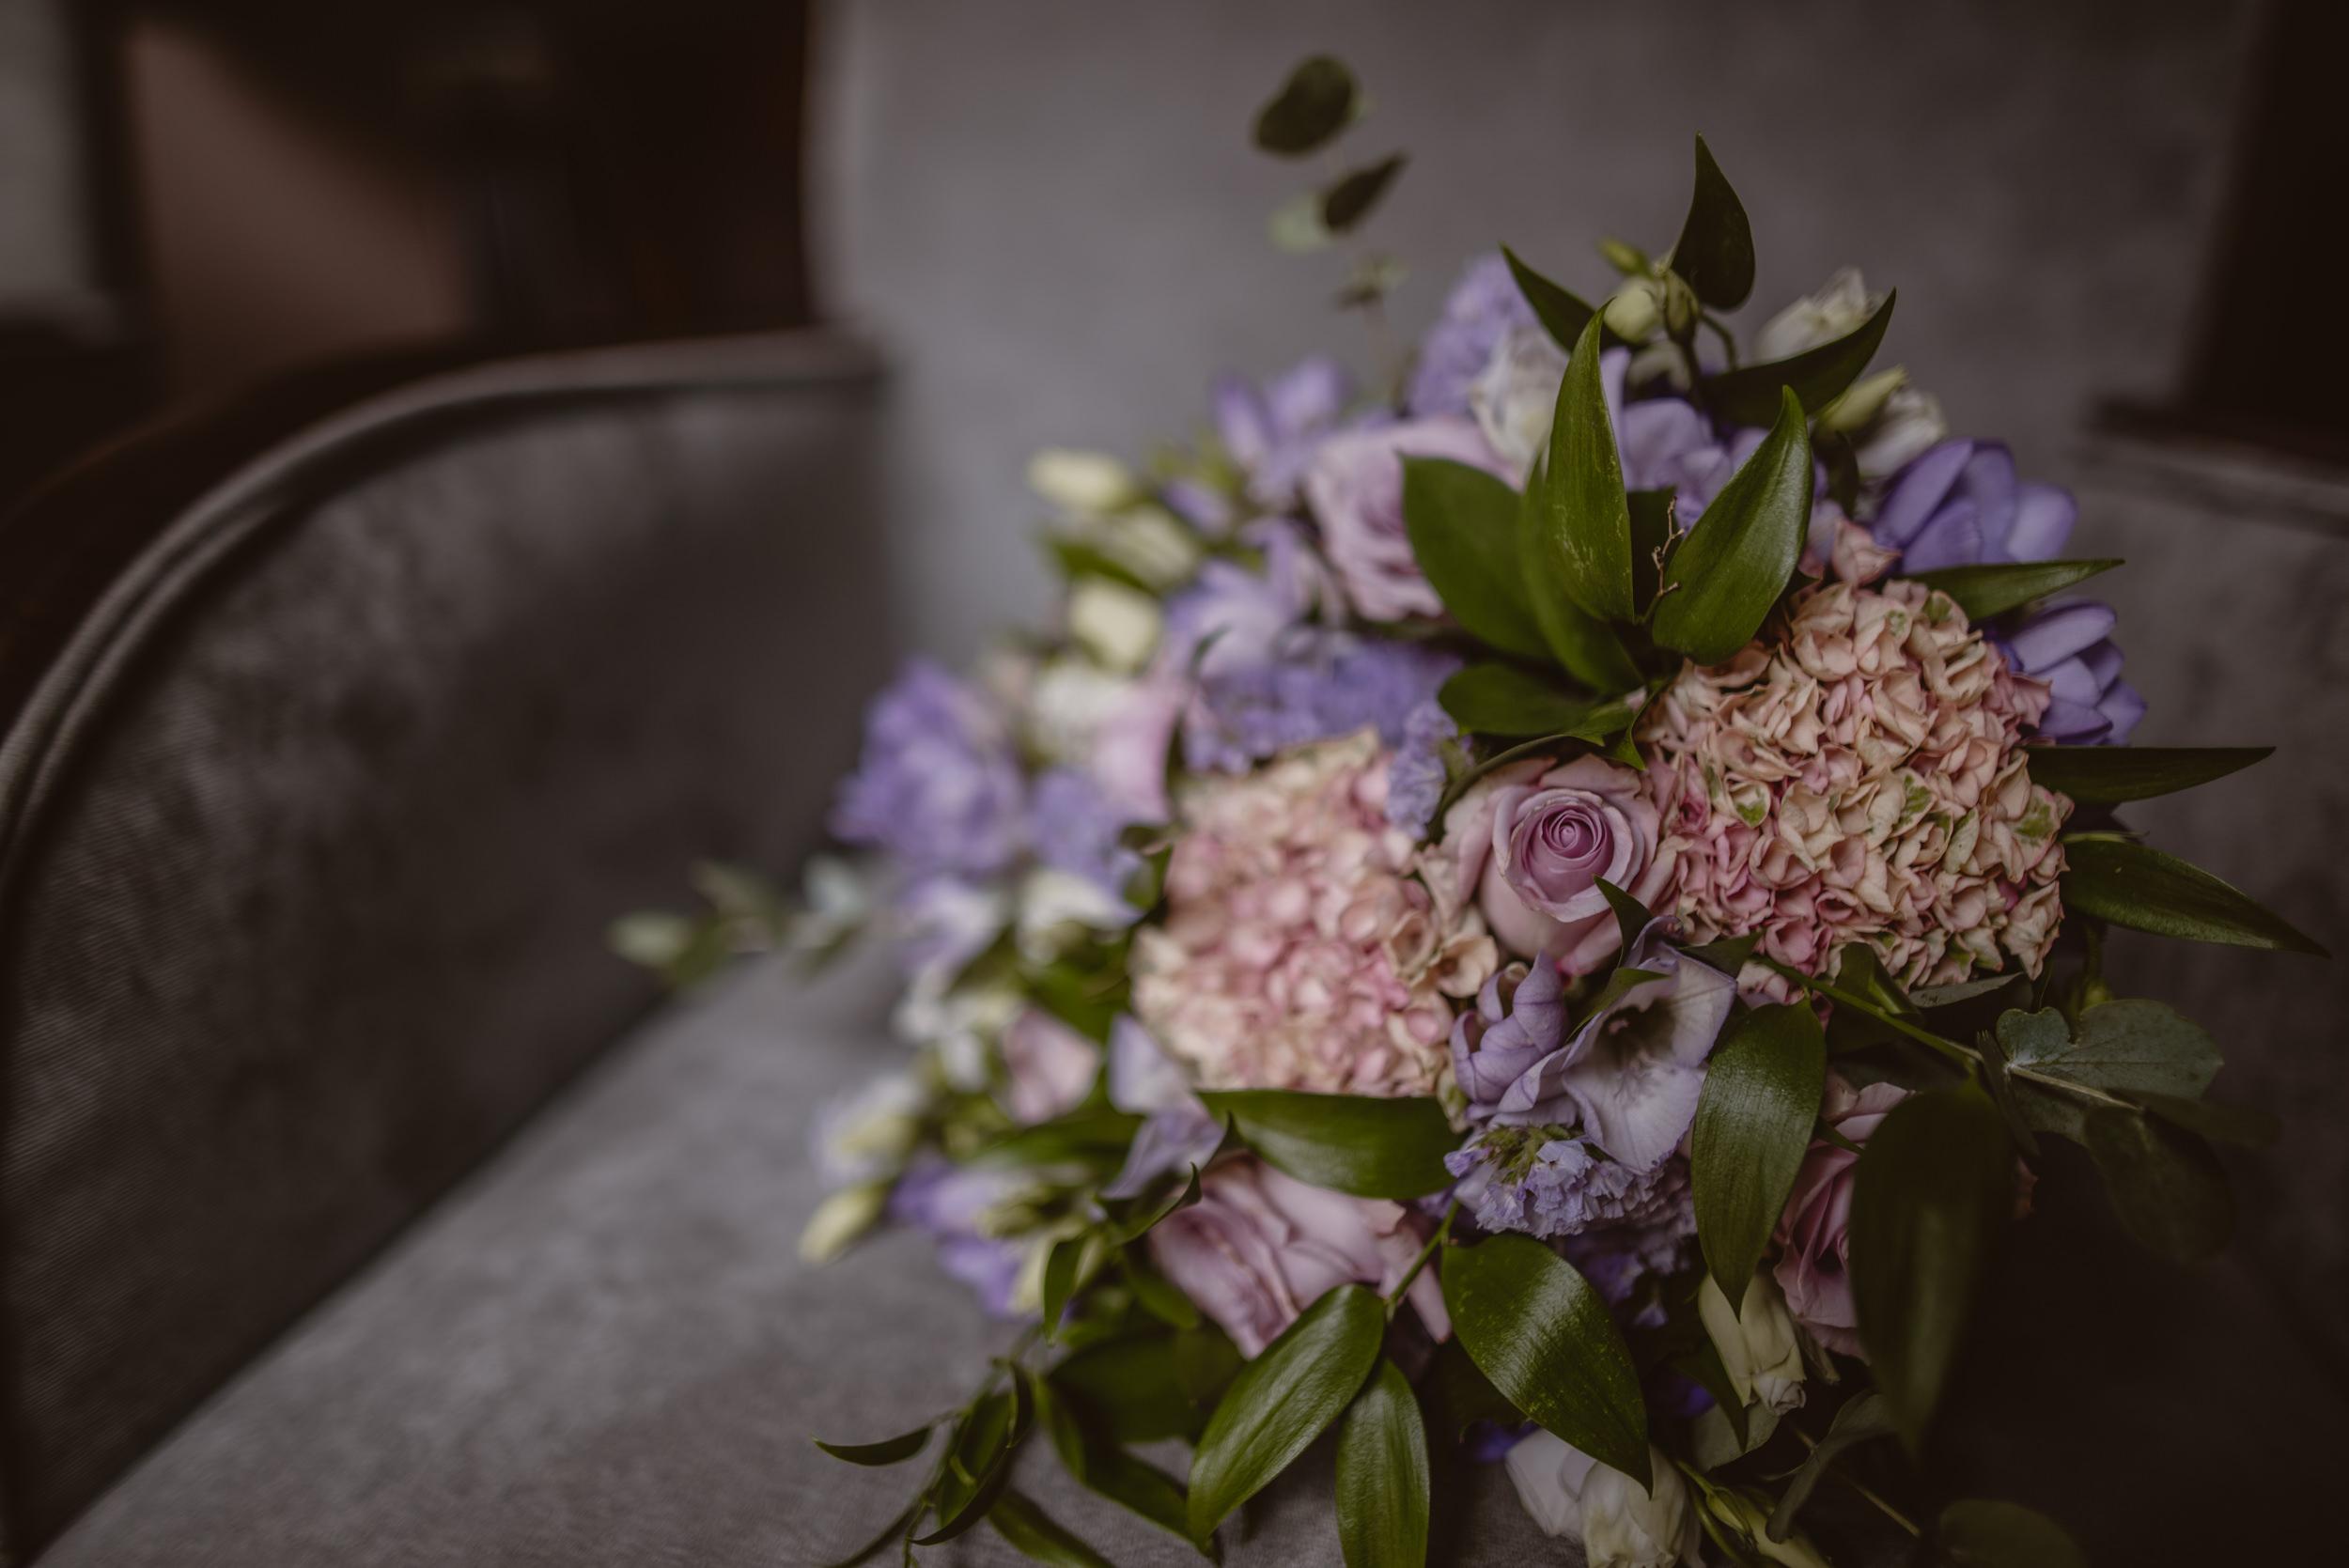 Chantelle-and-Stephen-Old-Thorns-Hotel-Wedding-Liphook-Manu-Mendoza-Wedding-Photography-101.jpg